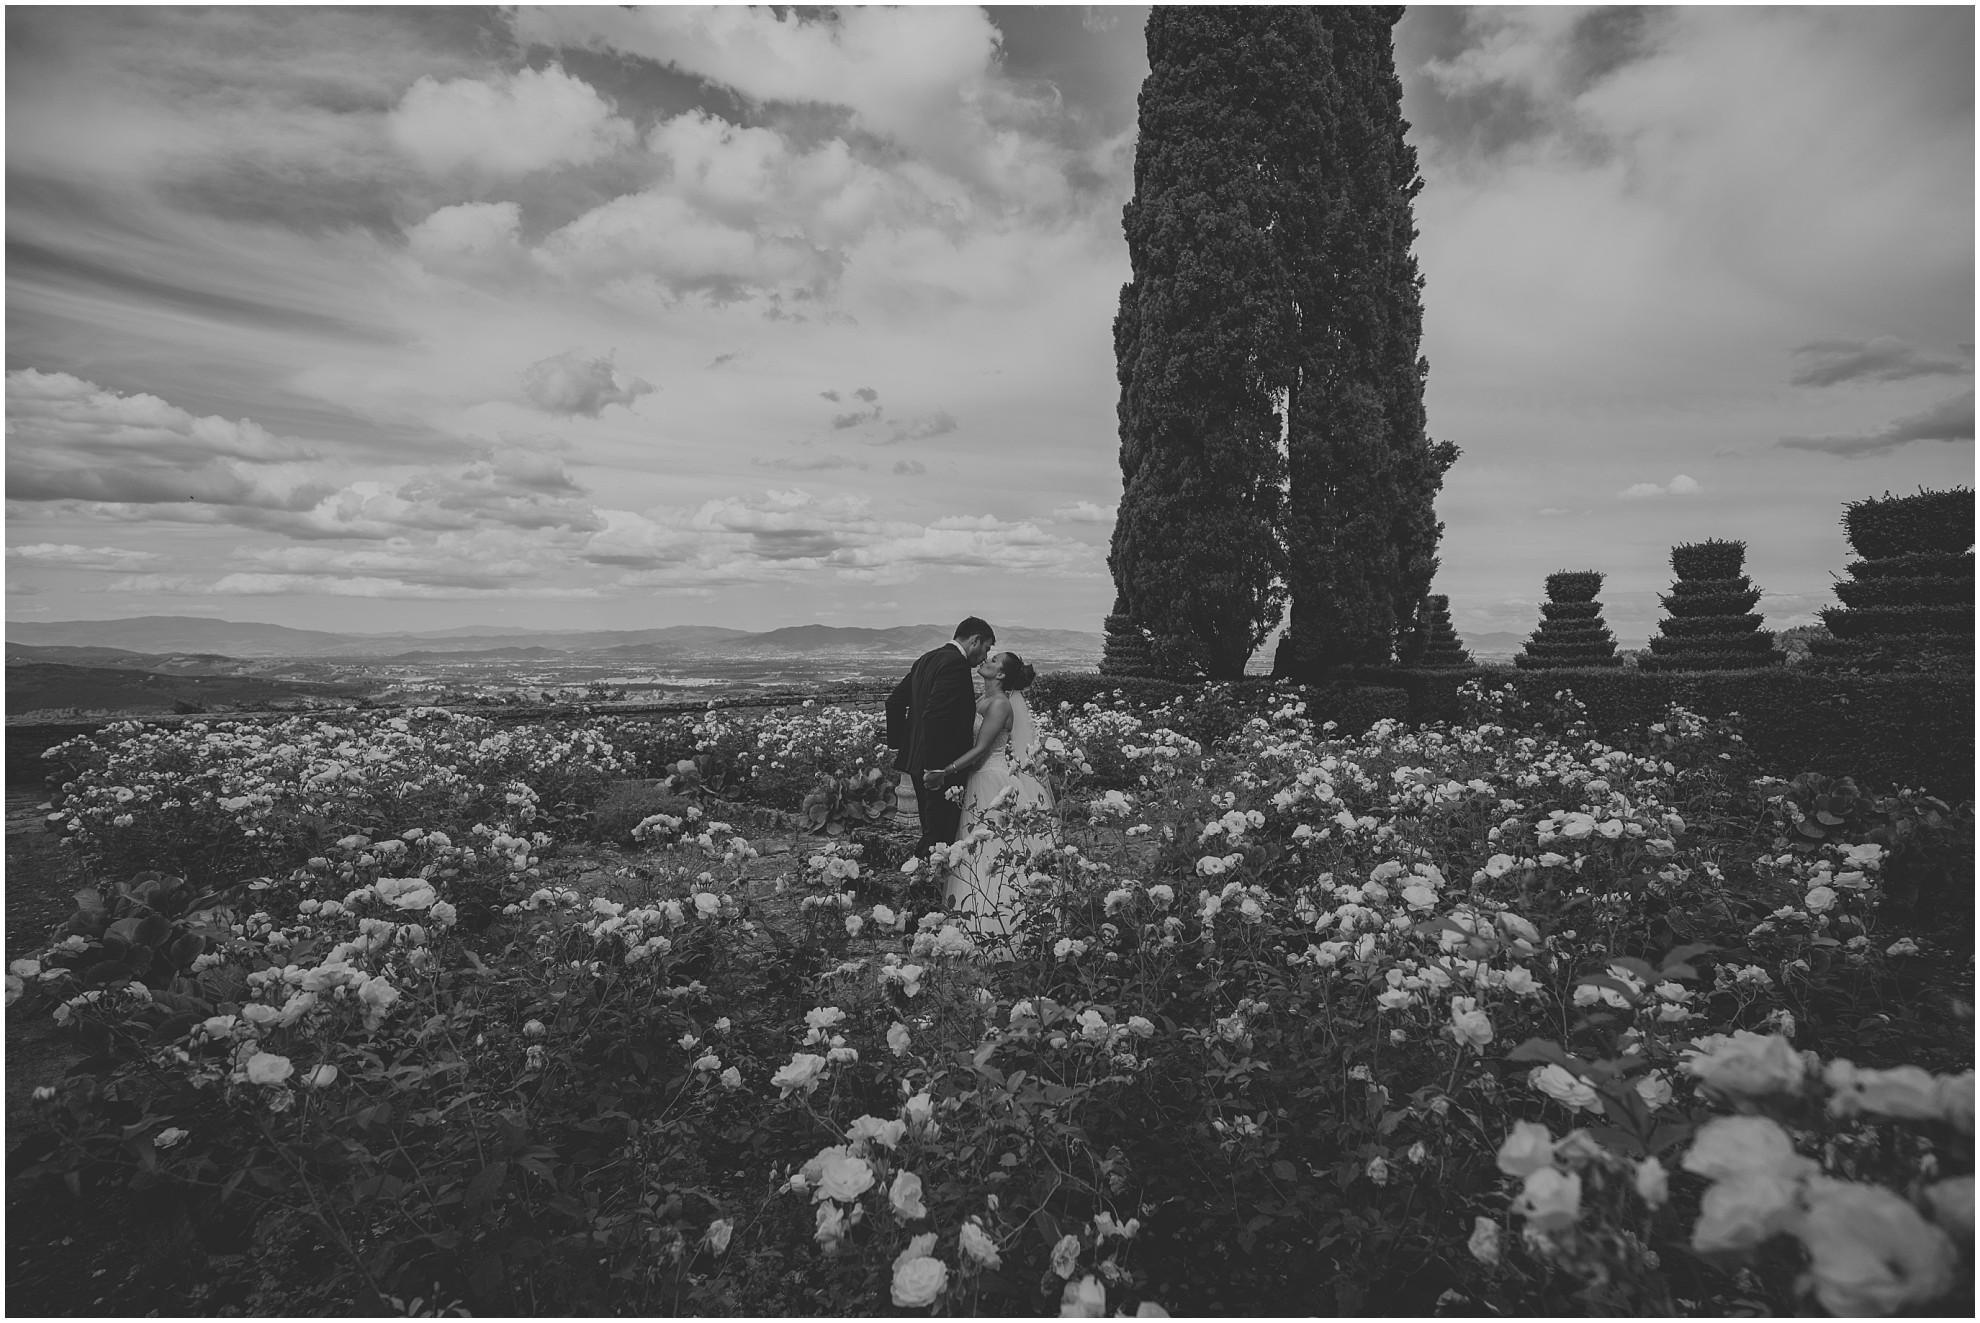 fotografo matrimonio toscana luca tibberio castello di gargonza